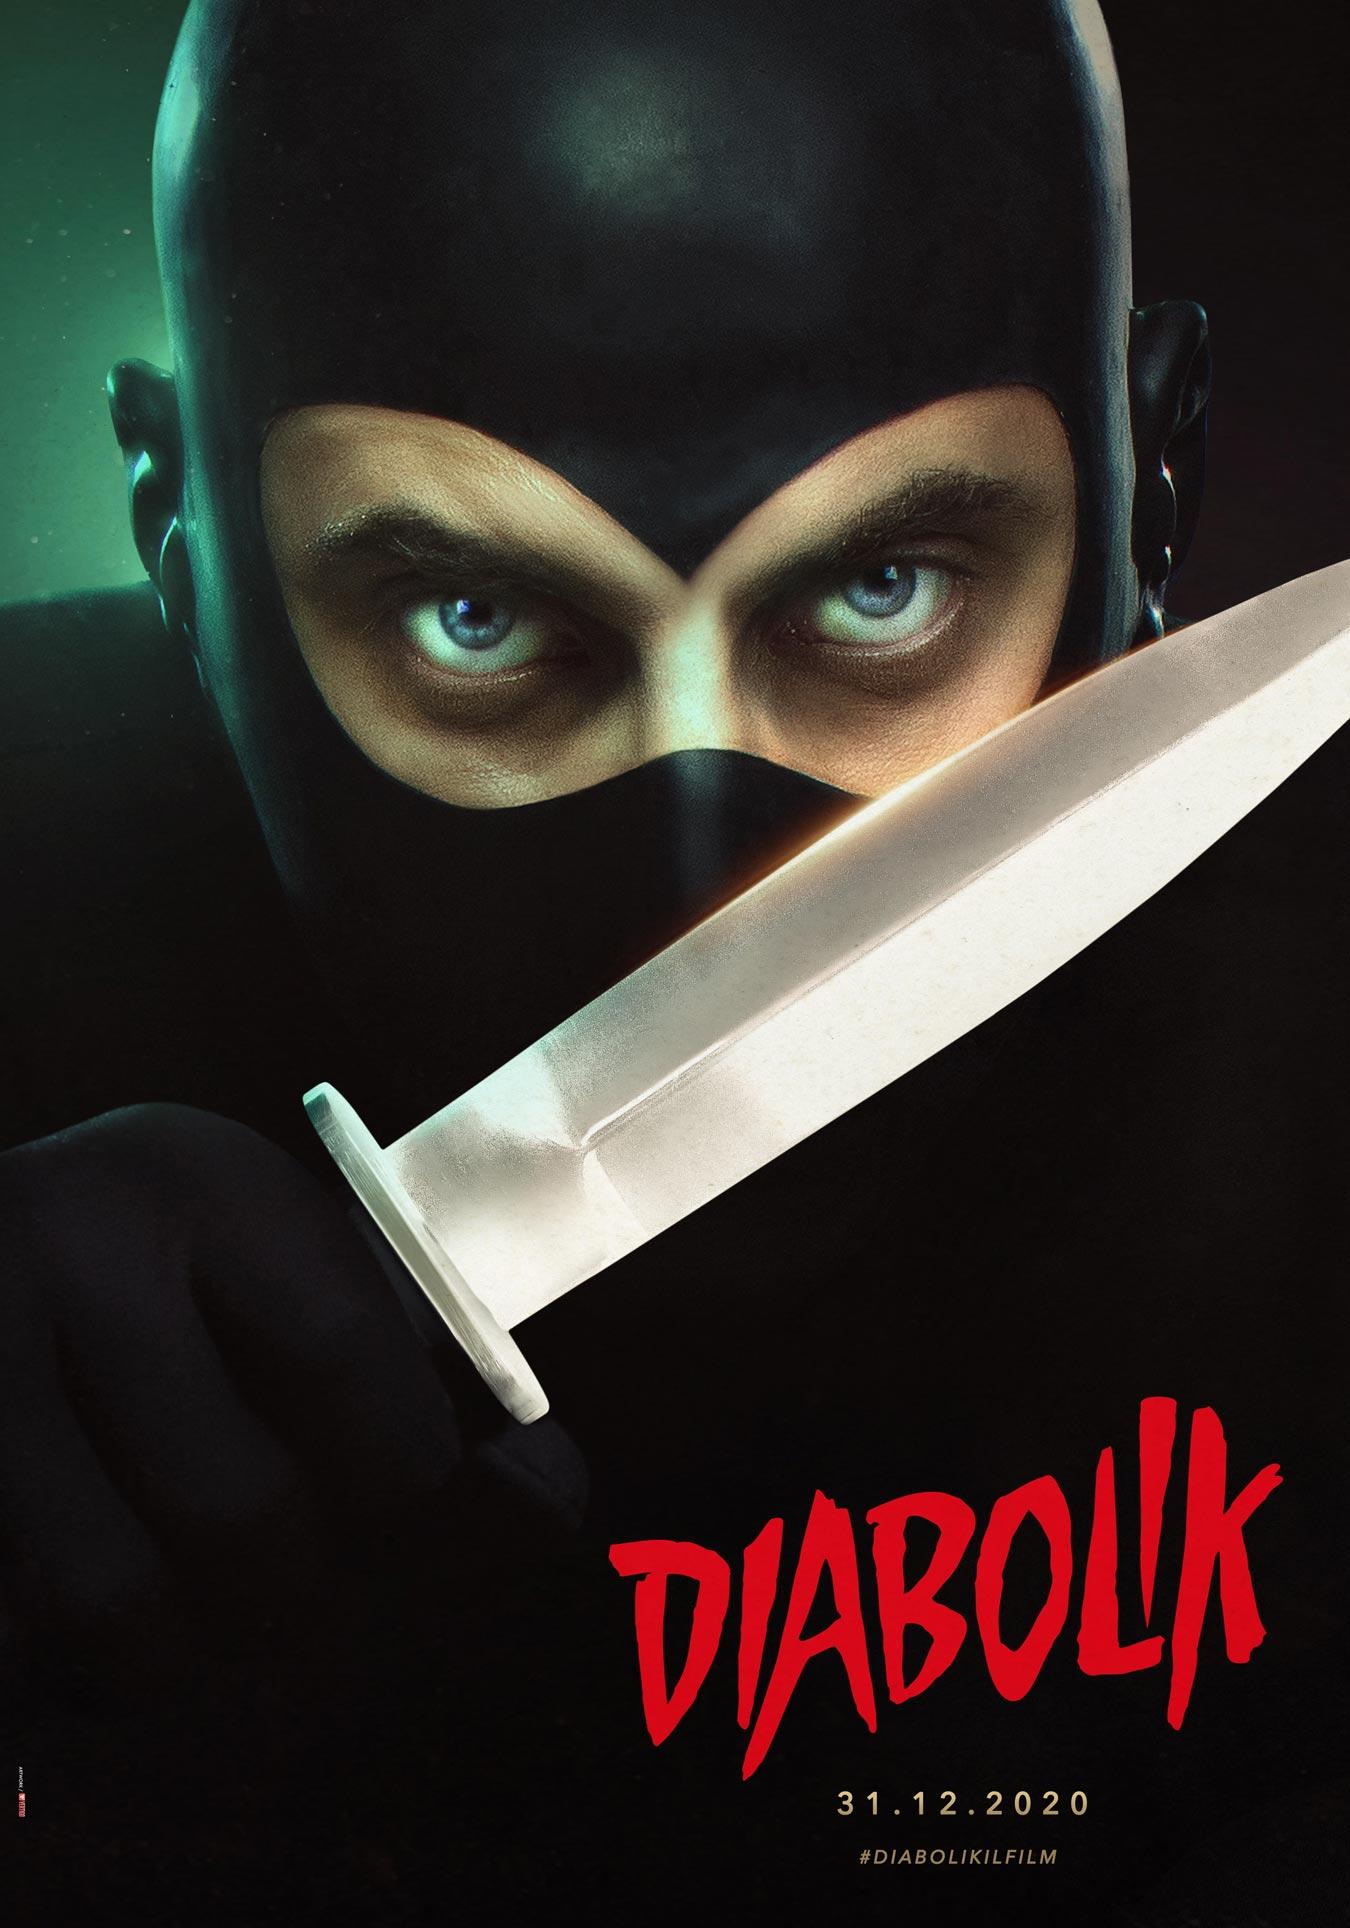 Diabolik character poster